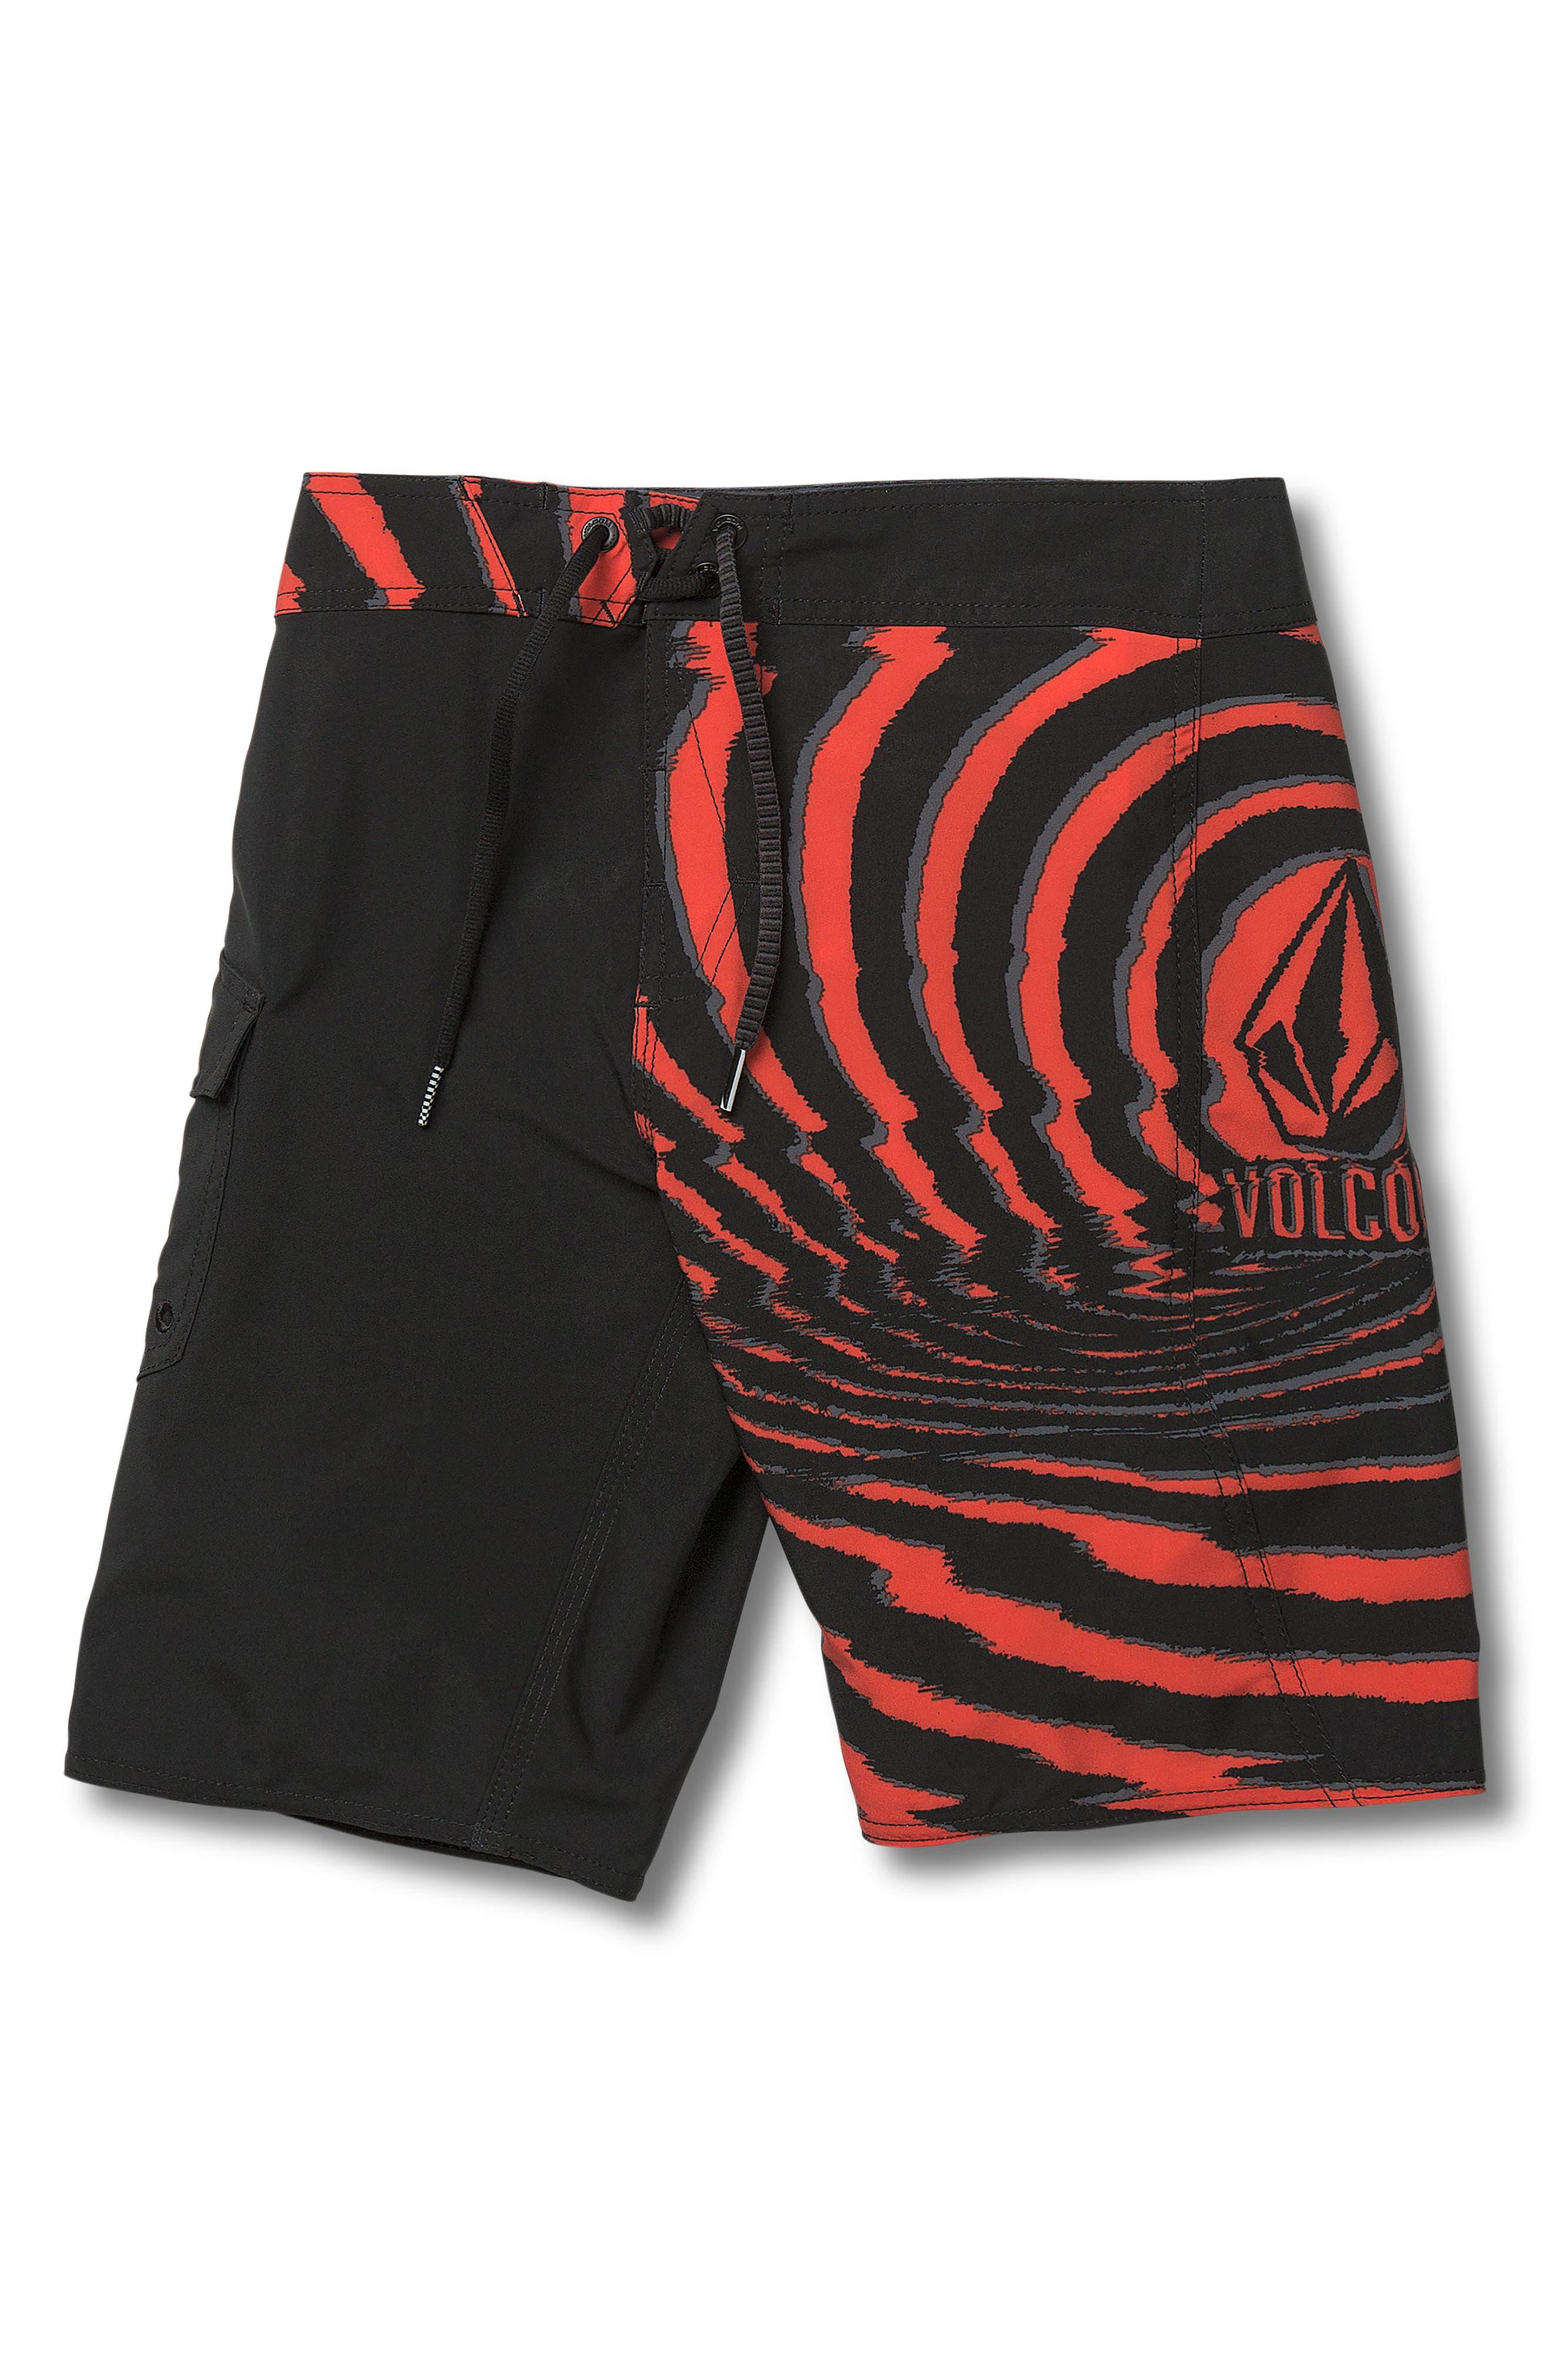 VOLCOM, Lido Block Mod Board Shorts, Main thumbnail 1, color, WHY ROCK RED